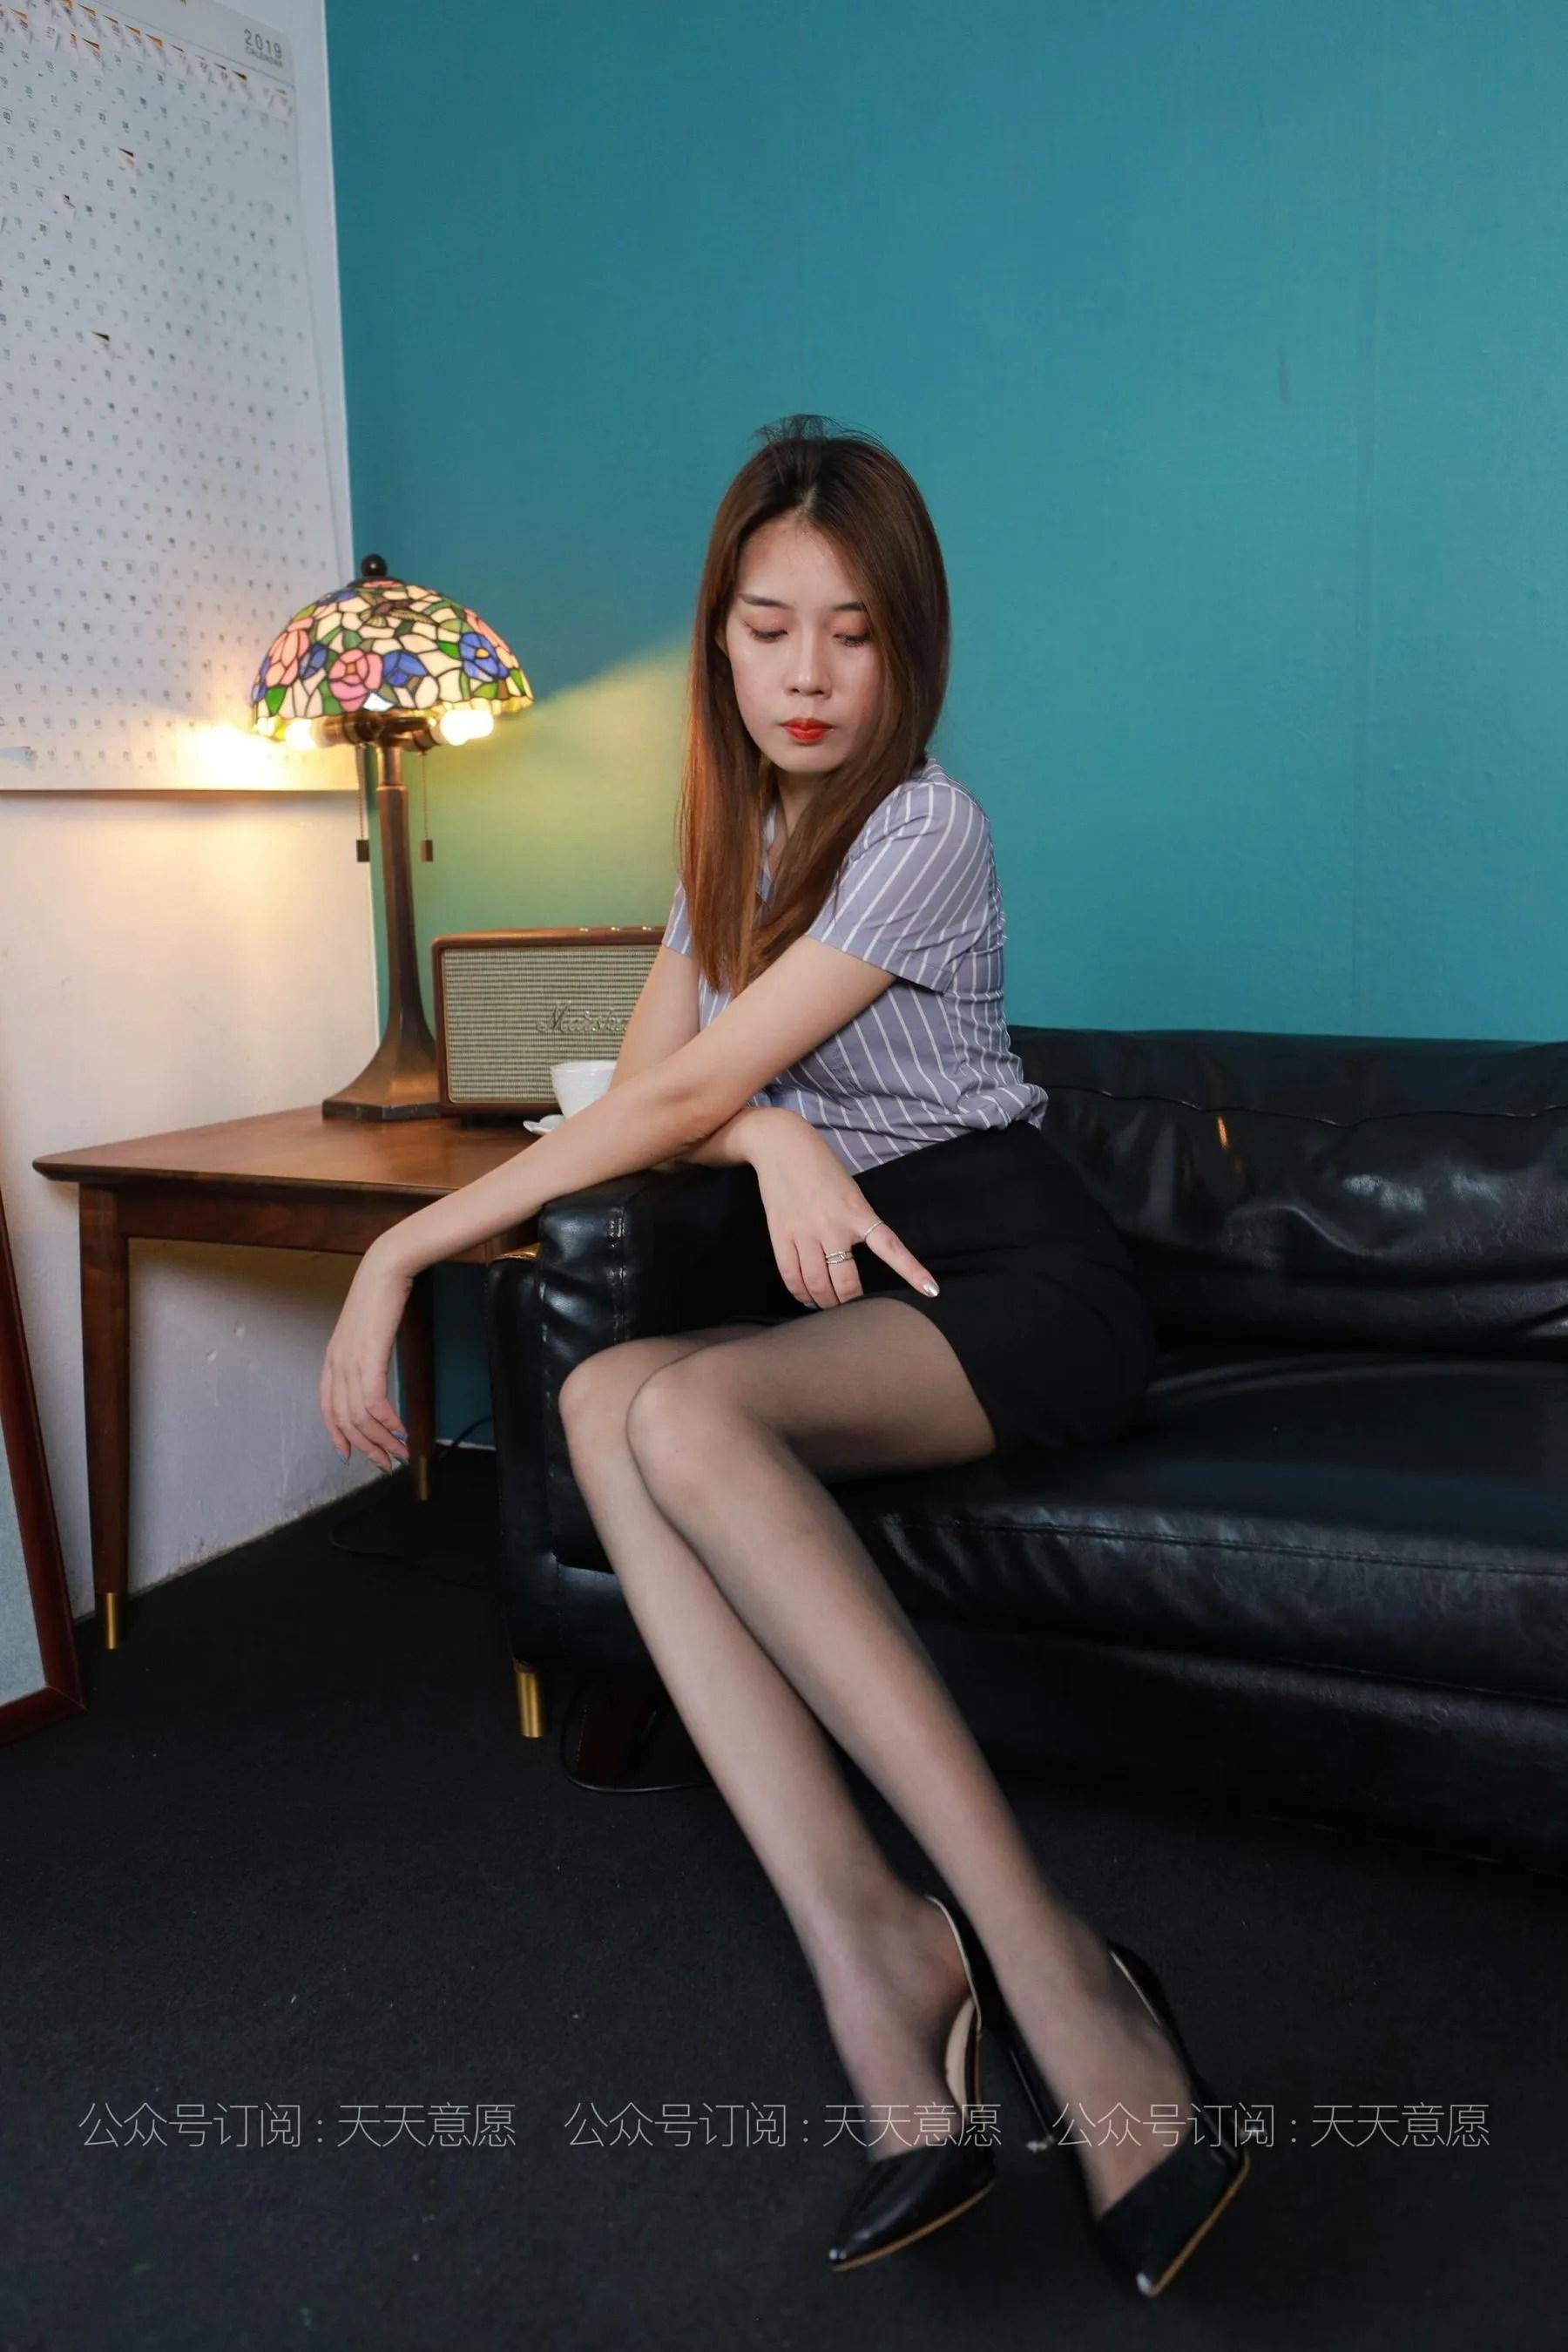 [IESS] 丝享家816: 西瓜《美腿细长直》[92P]插图(6)